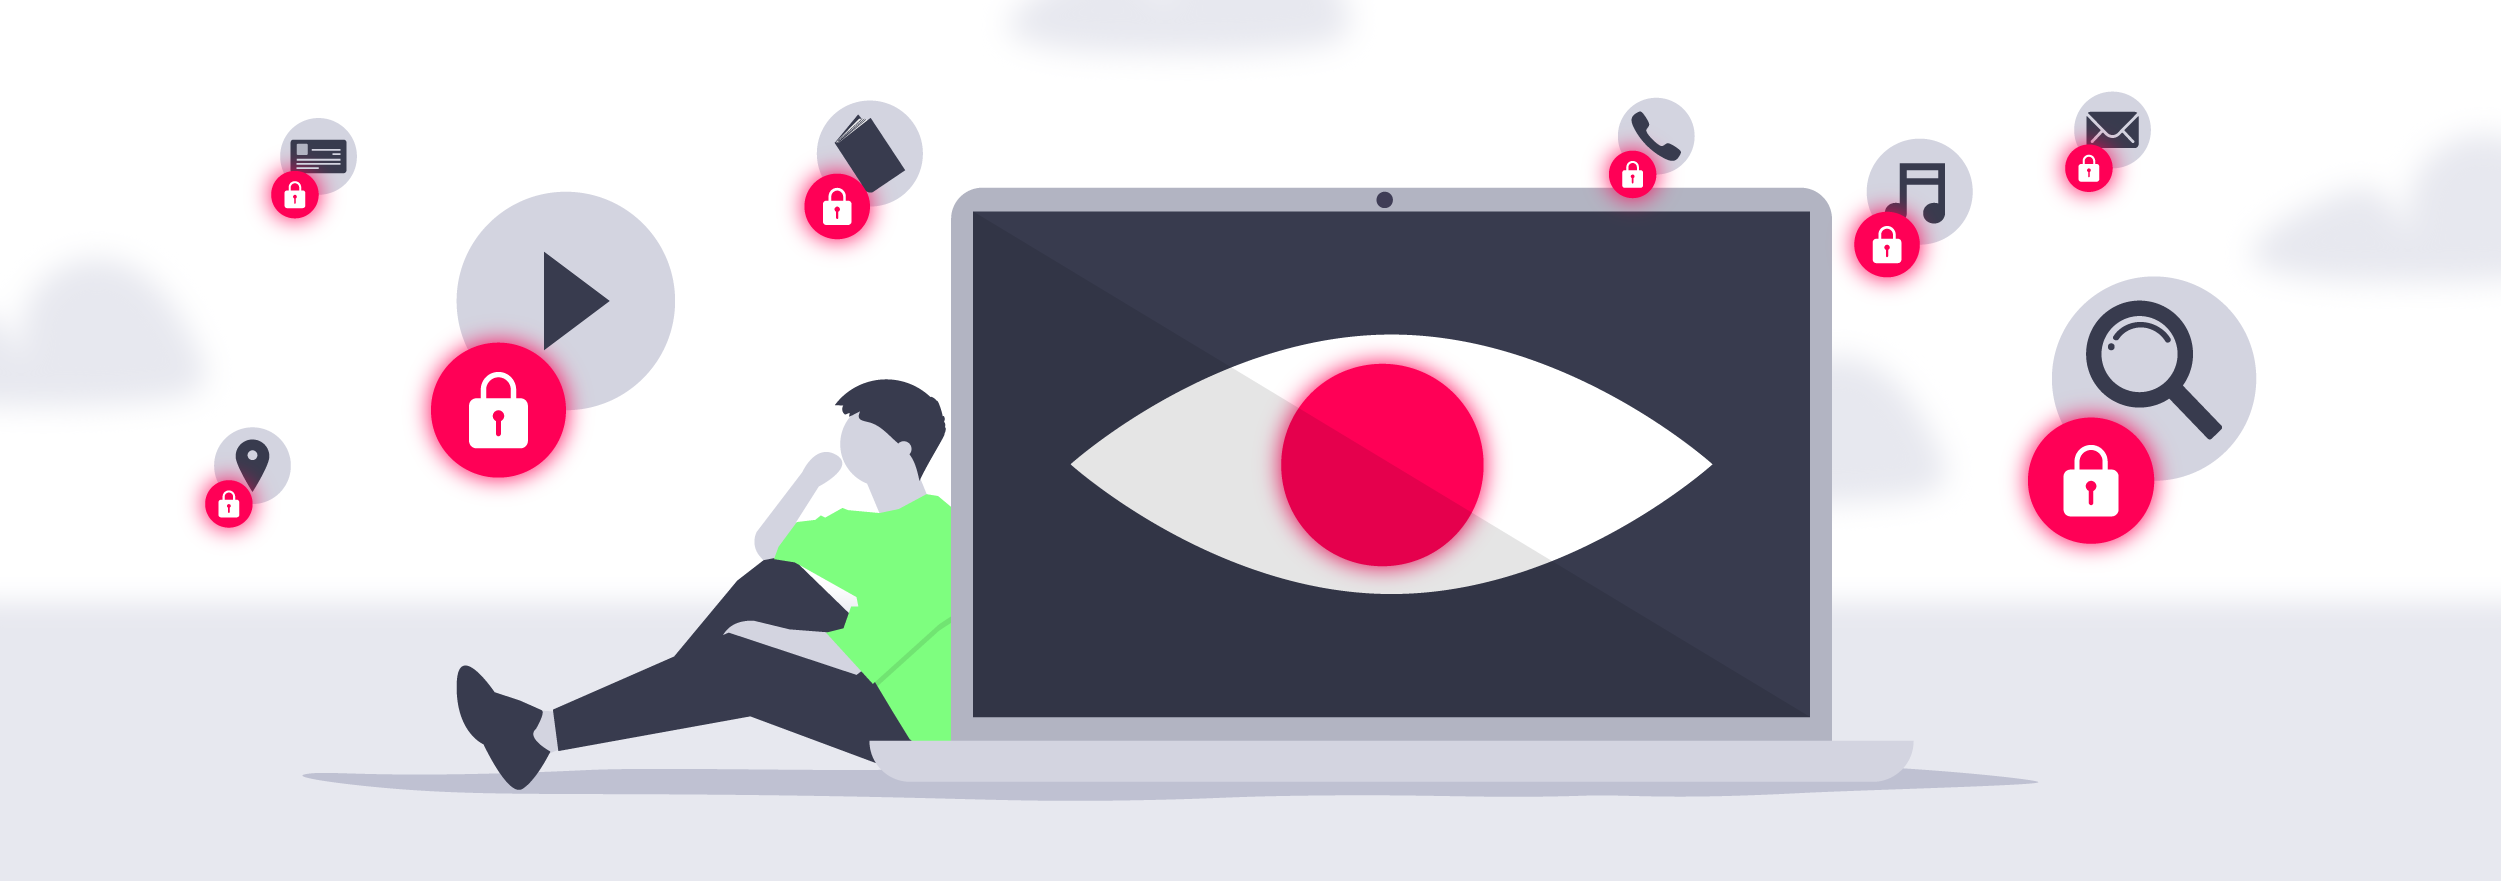 Marketing in Data-Sensitive Industries. Personalization vs. Privacy